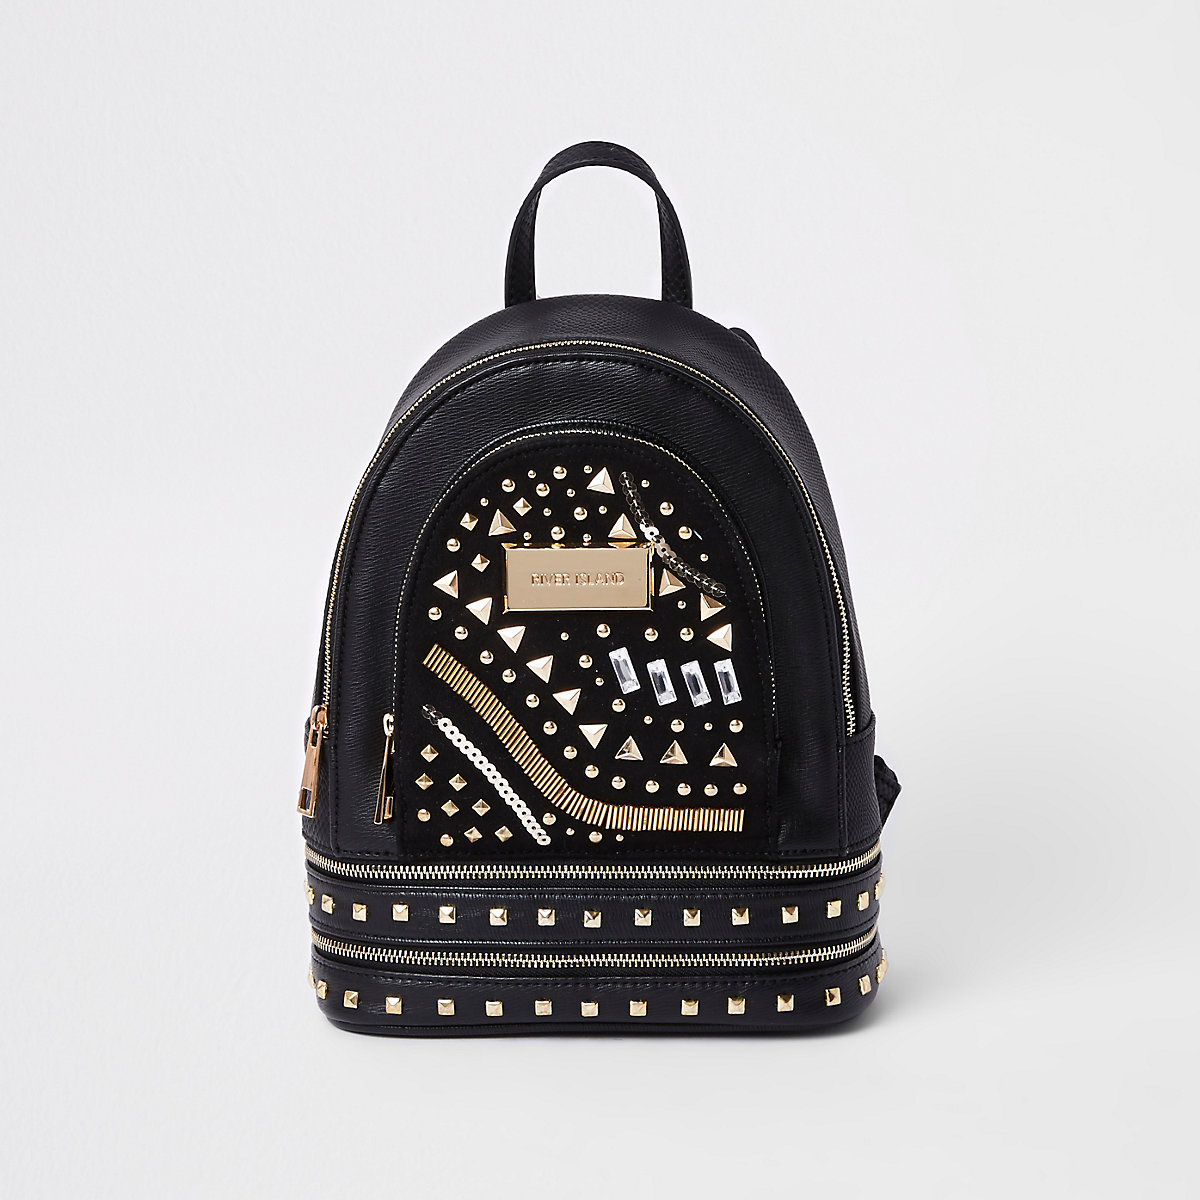 Black mini faux leather backpack